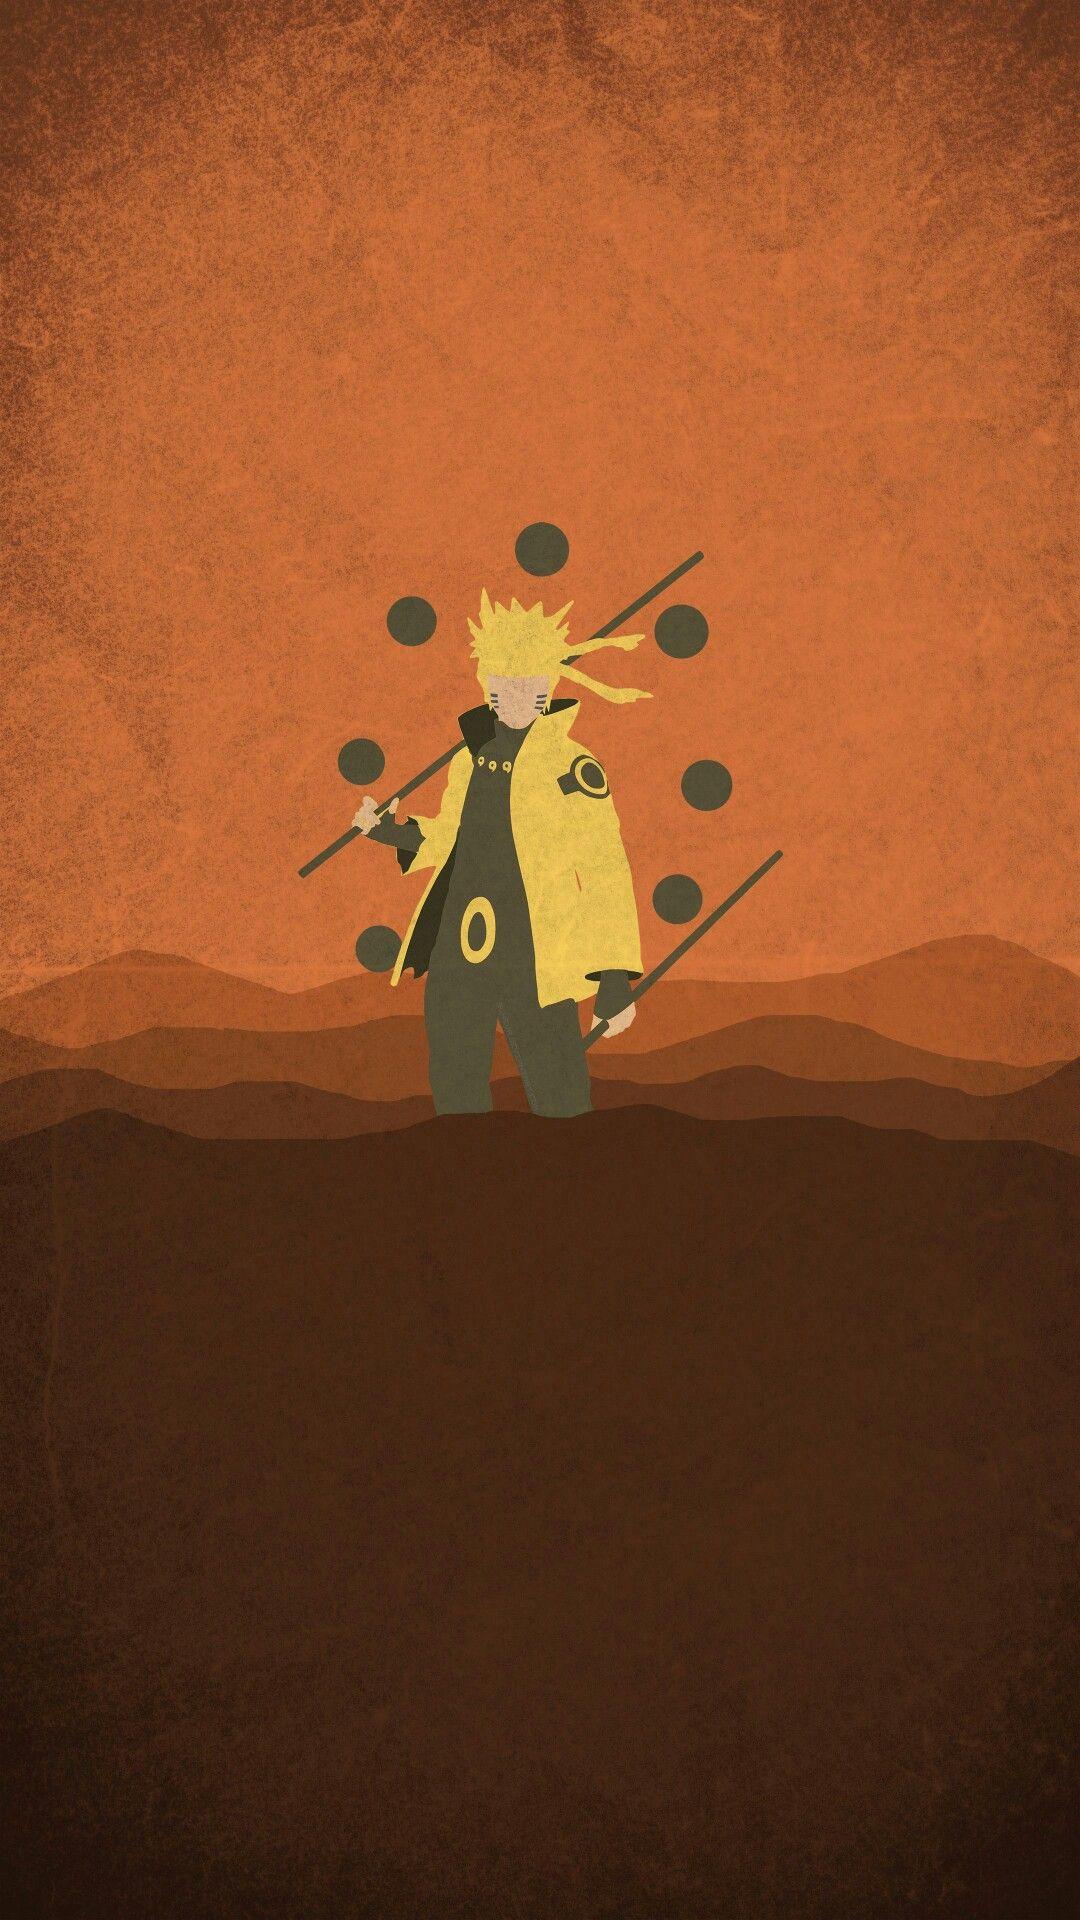 Pin by Jessica Wes on Konohagakure Wallpaper naruto